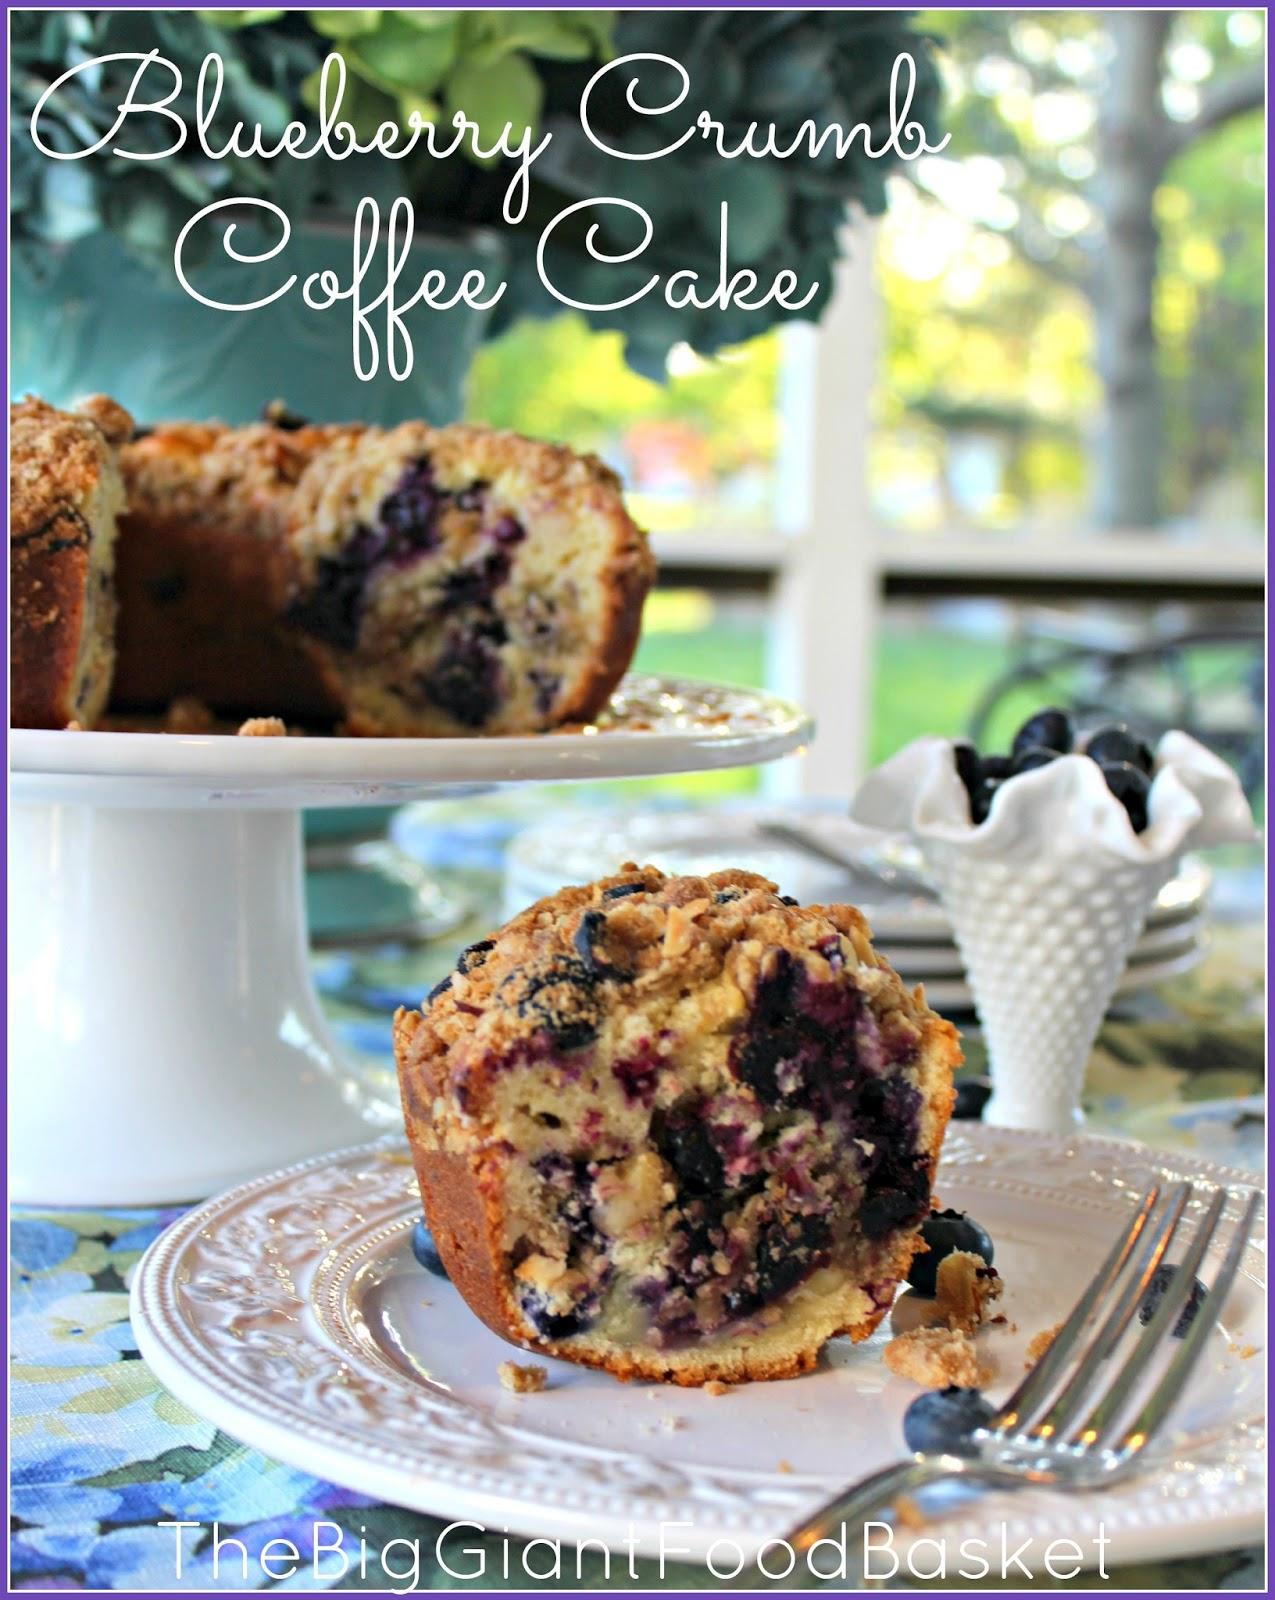 Big Crumb Blueberry Coffee Cake